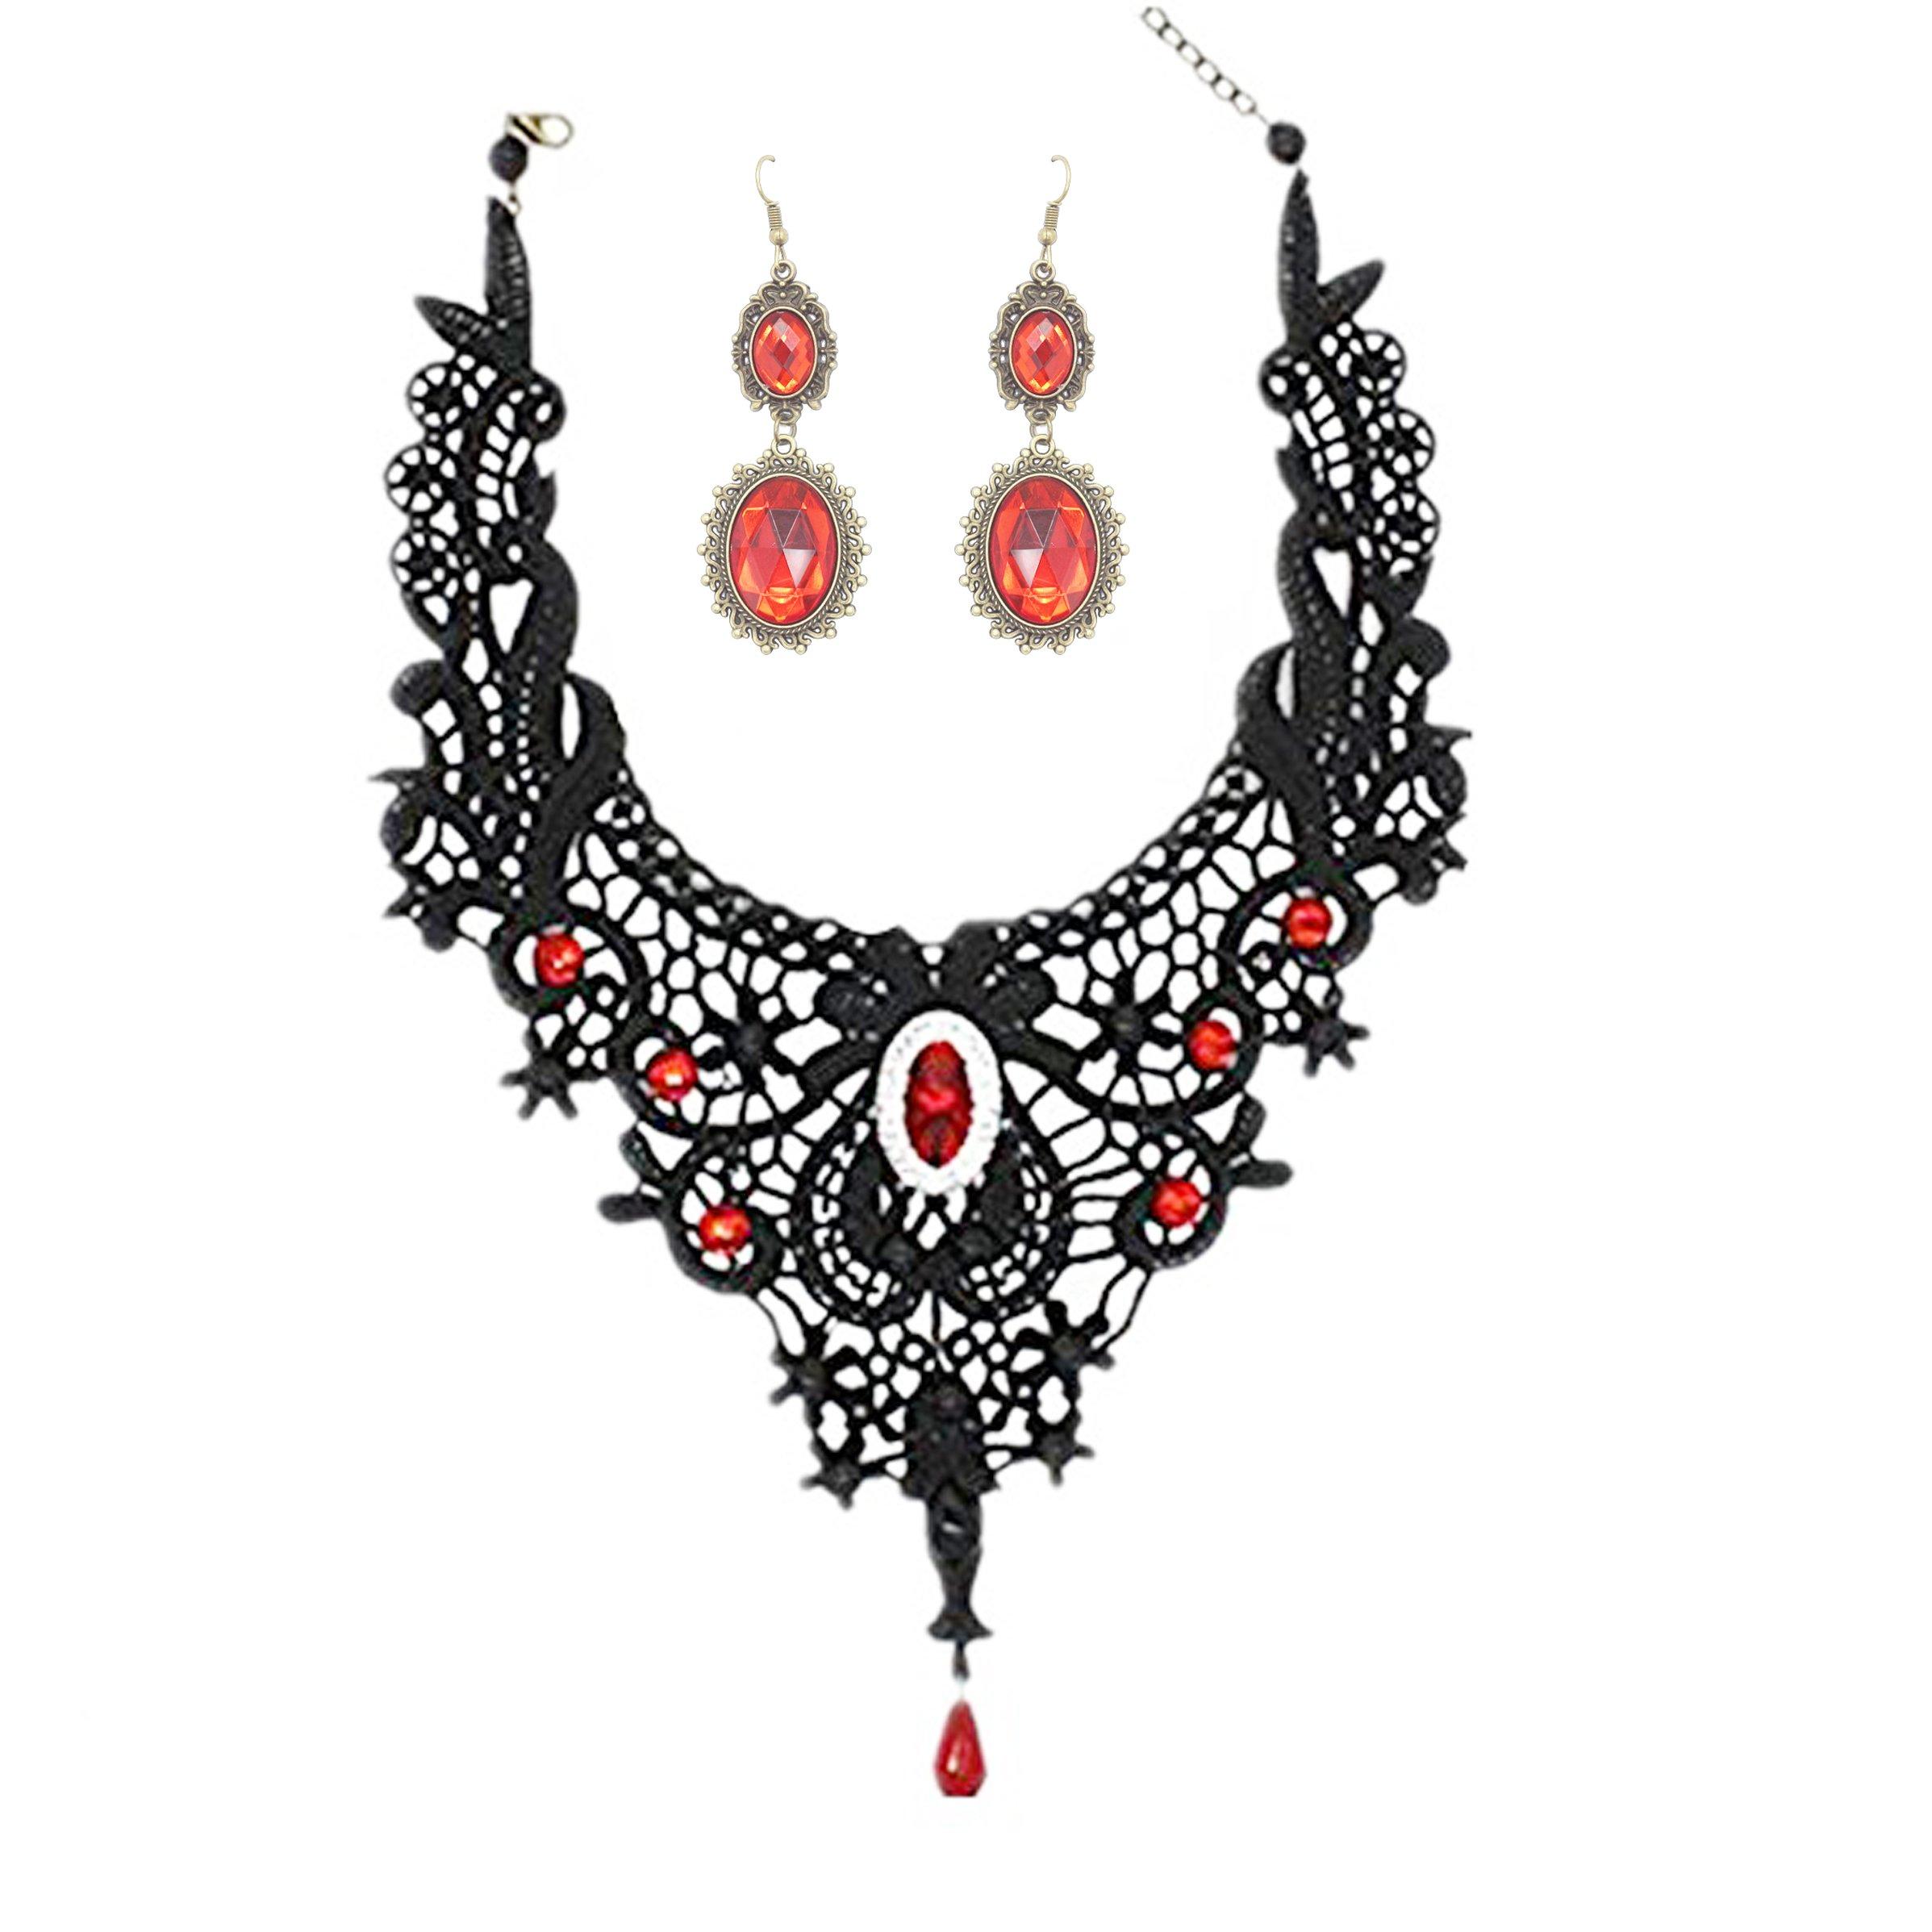 Meiysh Elegant Black Lace Gothic Lolita Red Pendant Choker Necklace Earrings Set (style 002)